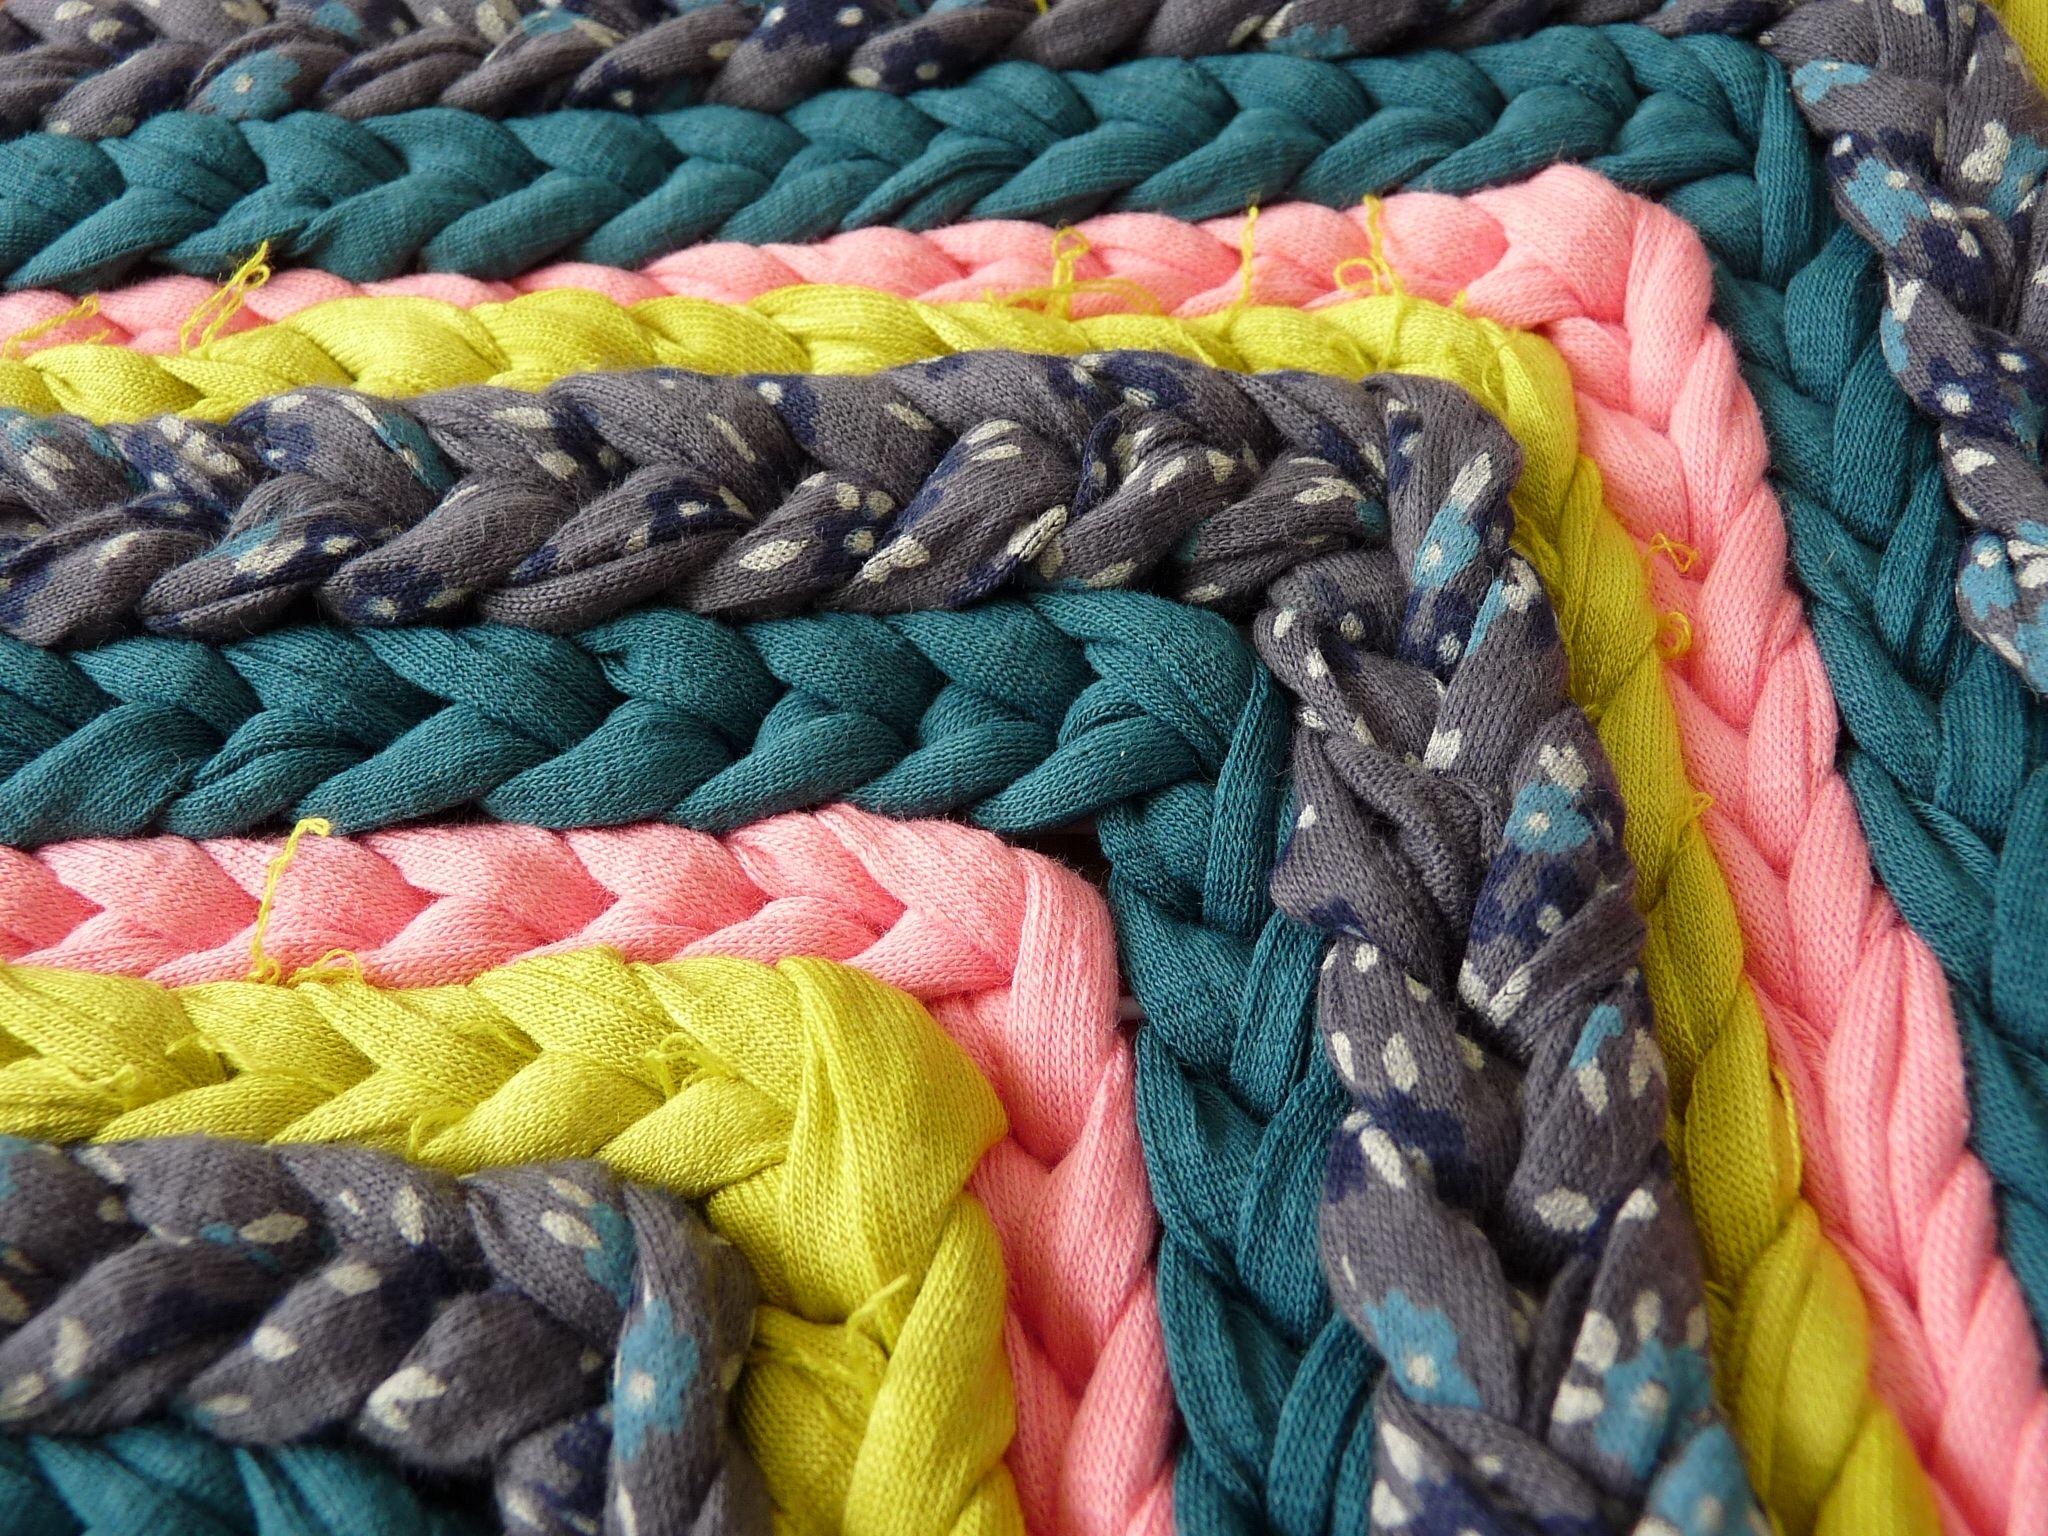 Detalle de mi última alfombra de trapillo. #crochet #ganchilloXXL #tirelas #totora #diyrug